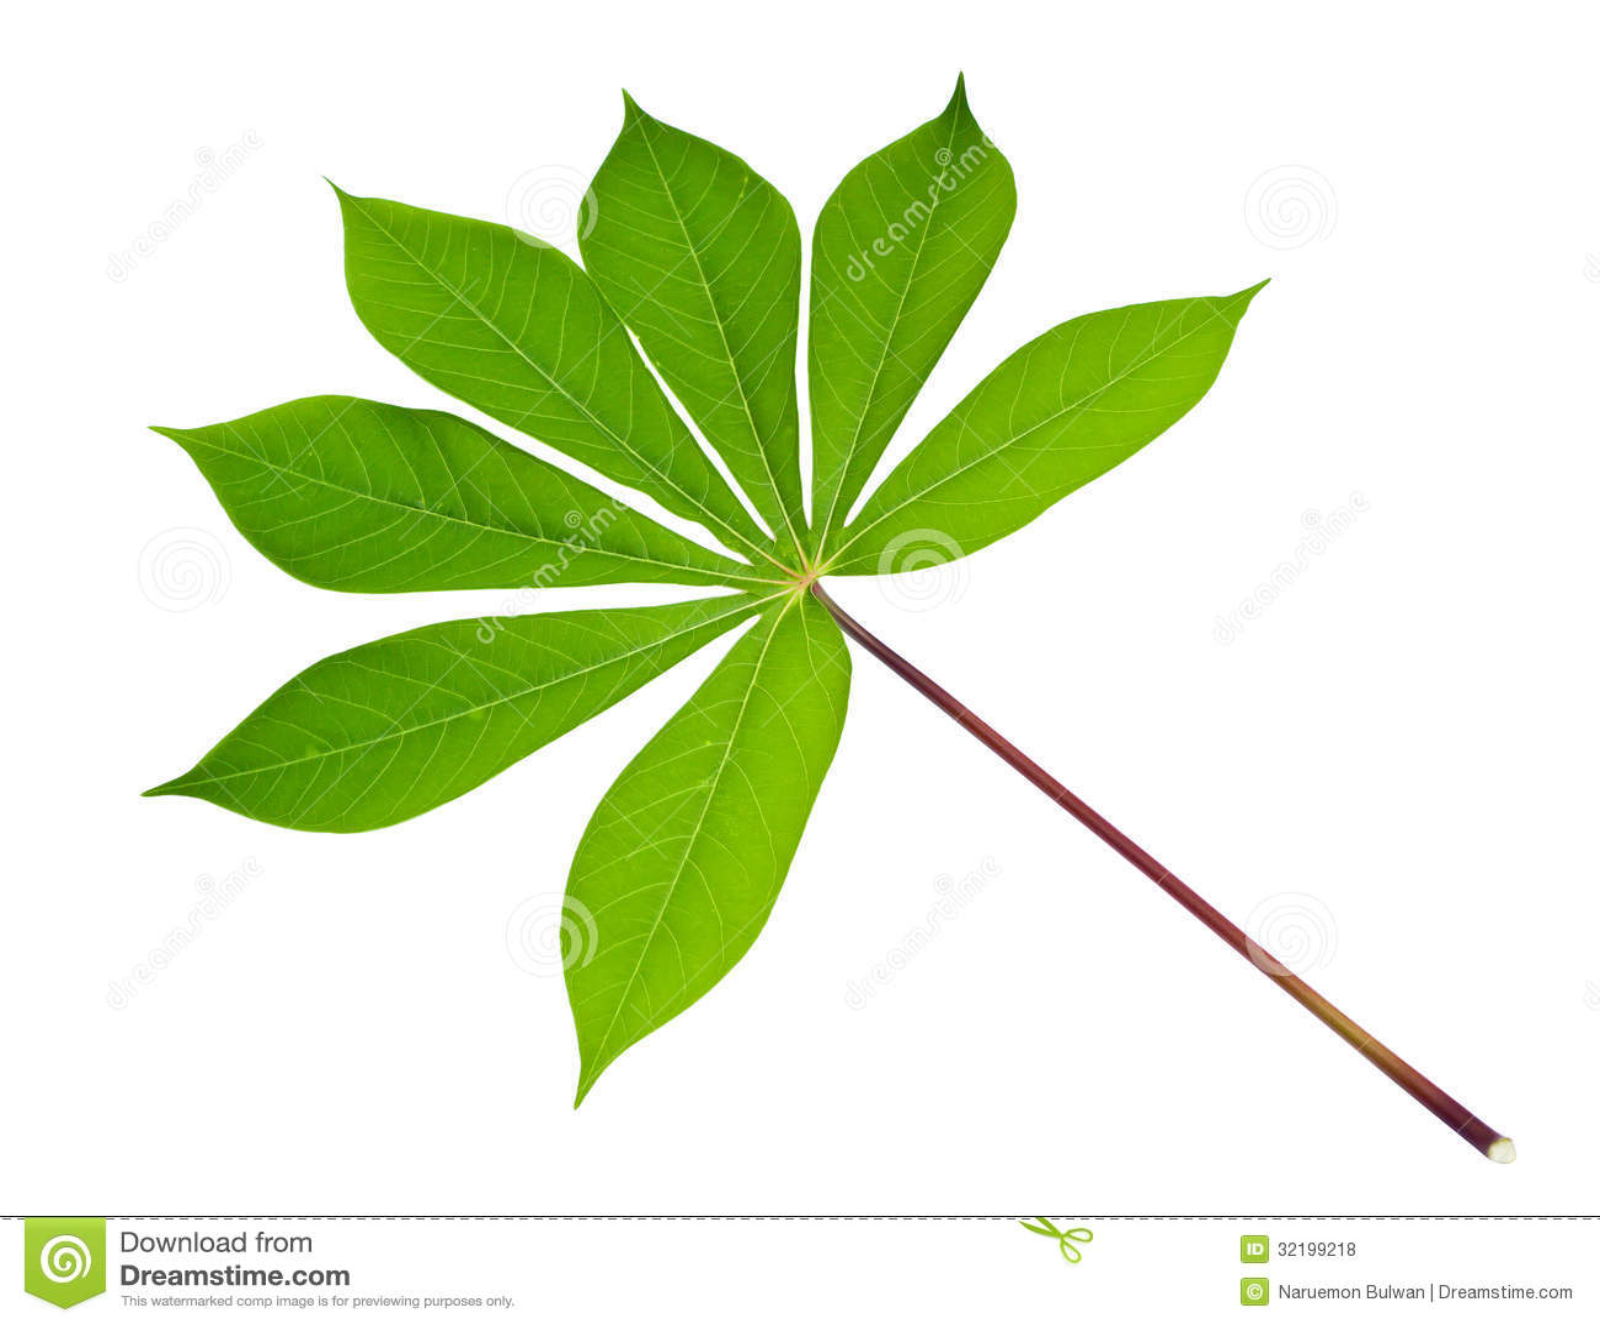 Cassava Leaf Royalty Free Stock Photos - Image: 32199218